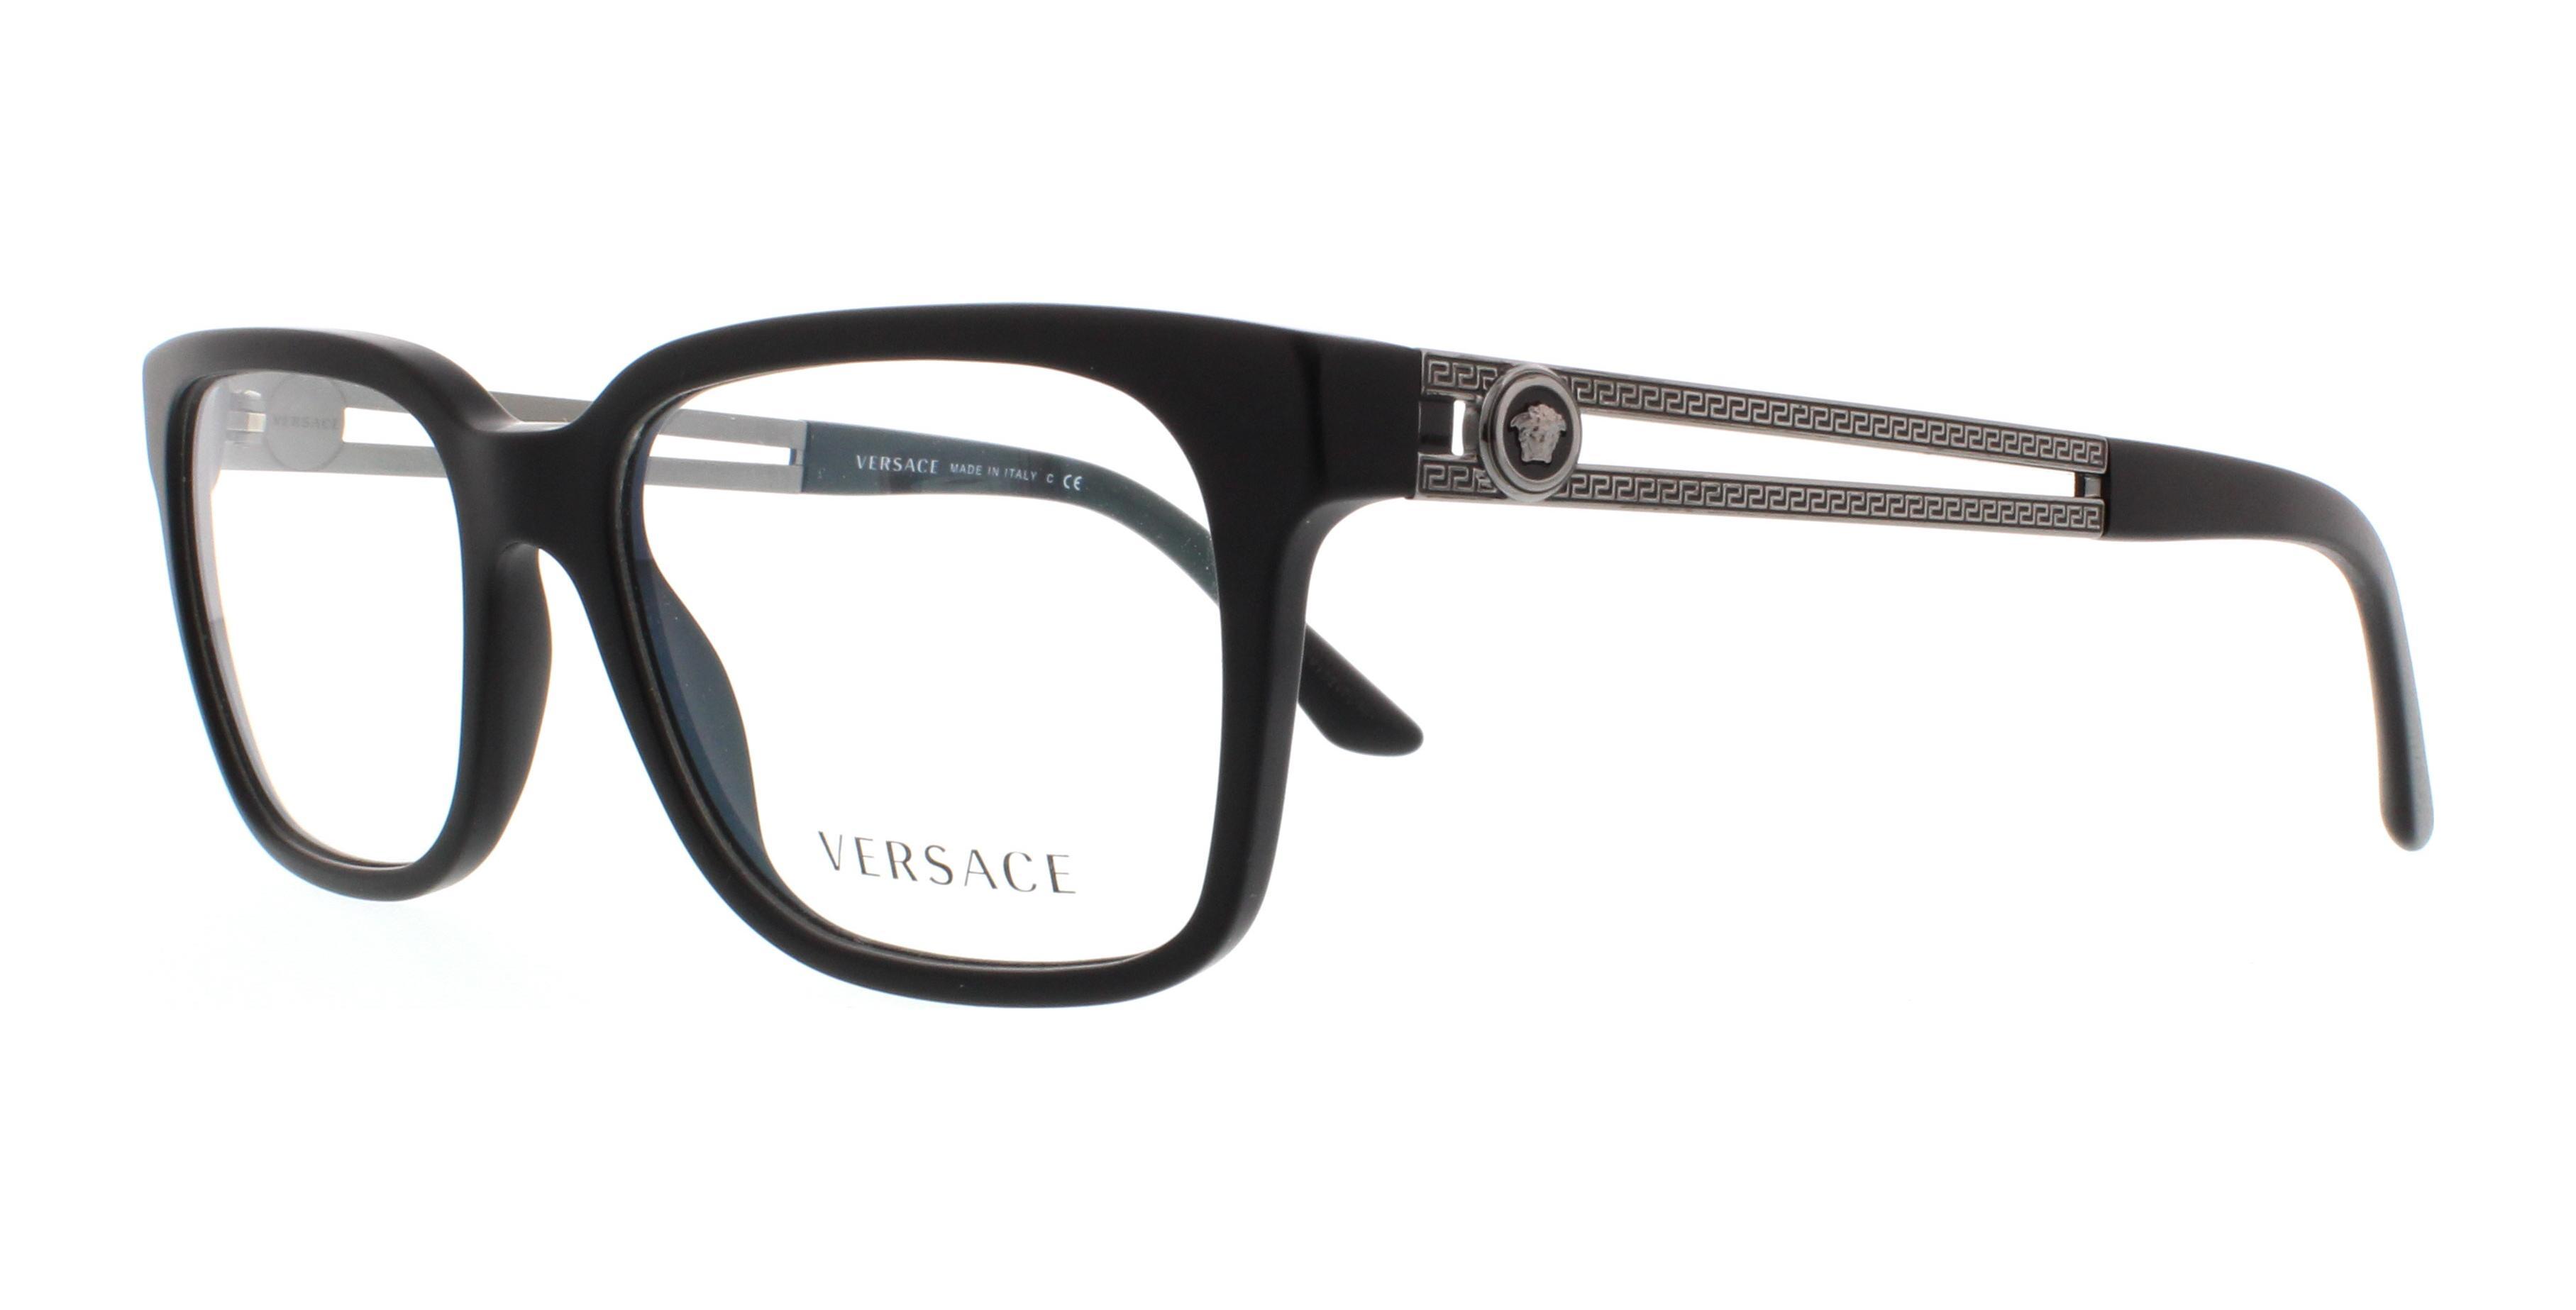 2200f46da9c VERSACE Eyeglasses VE3218 5122 Black Sand 53MM 8053672468939